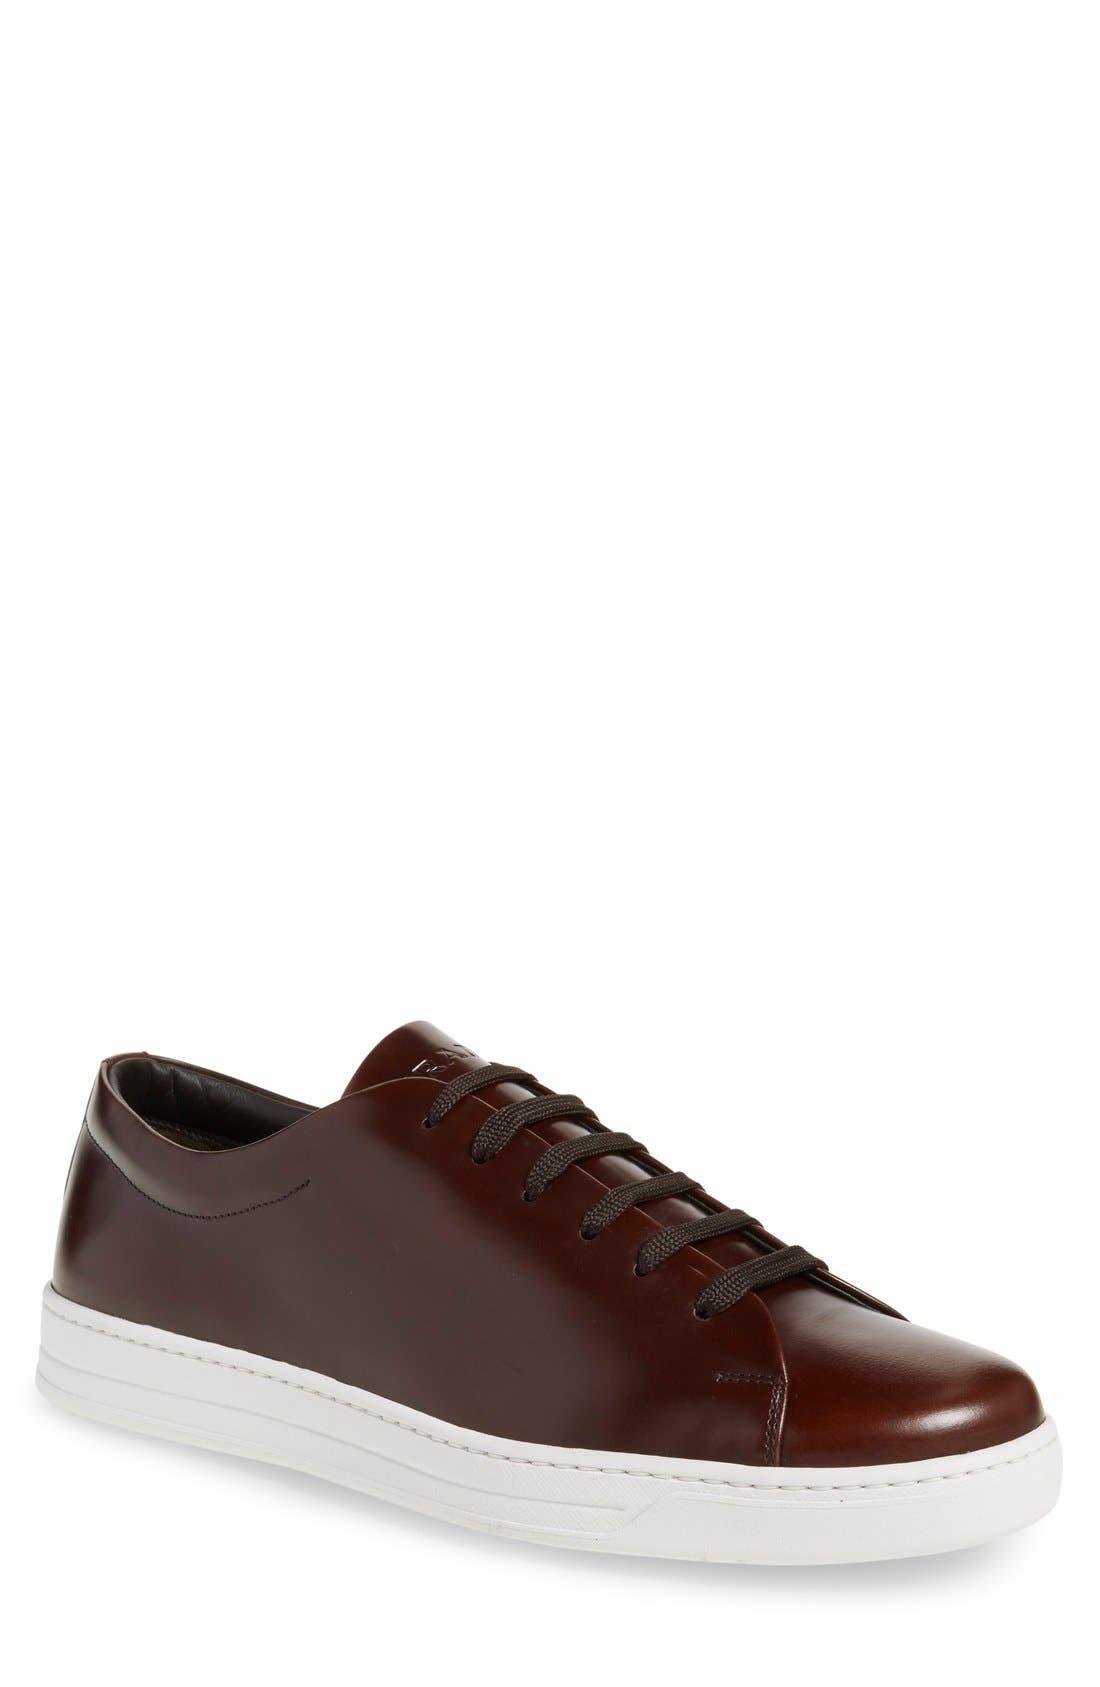 Prada Linea Rossa Low Top Sneaker (Men)